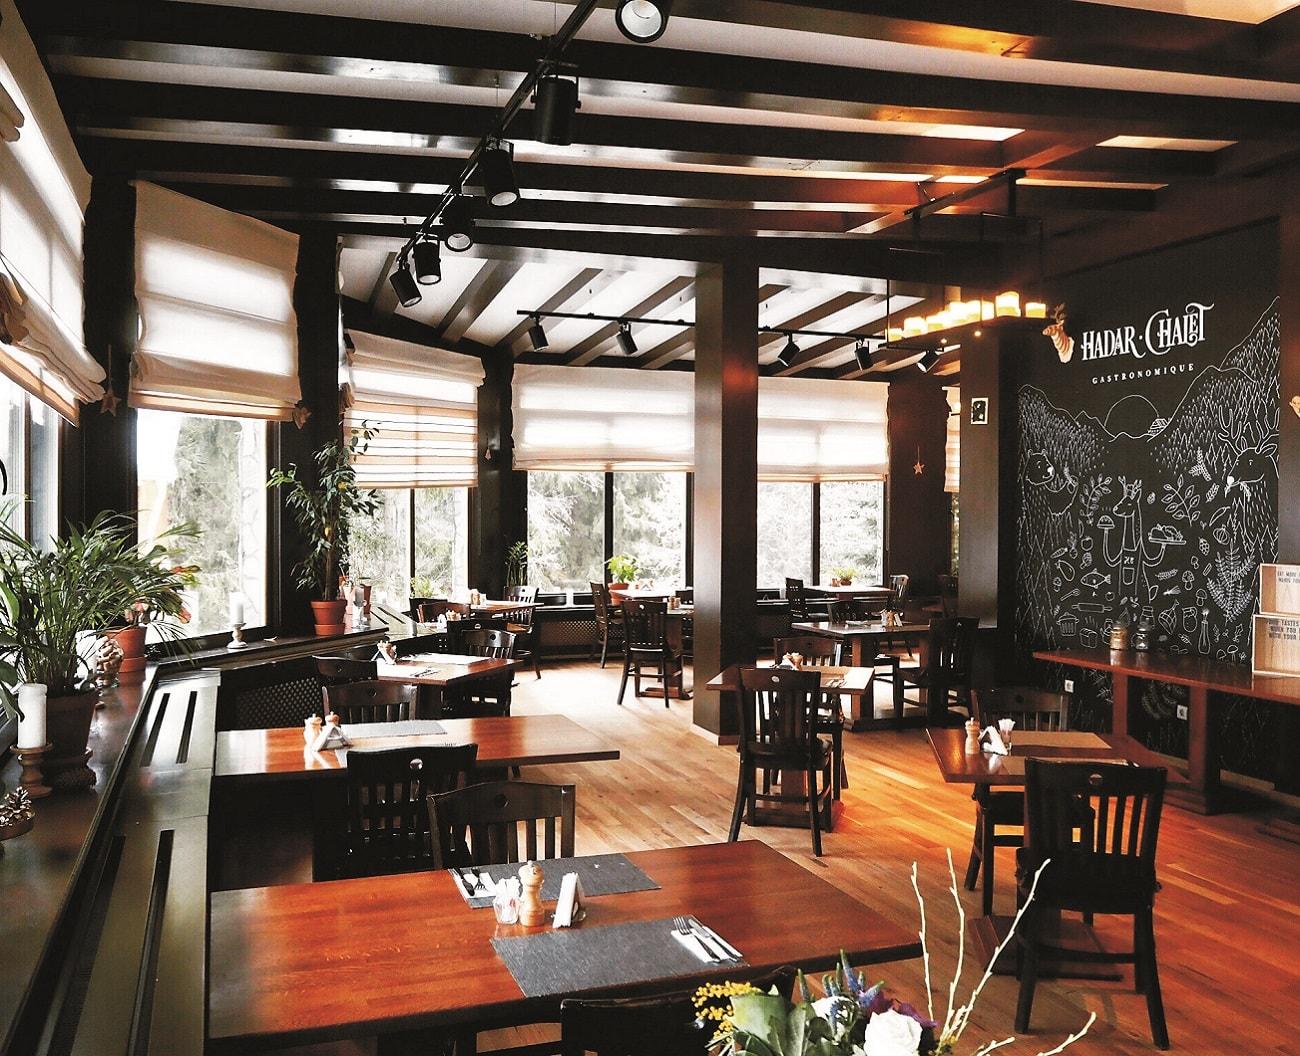 Hadar Chalet restaurant